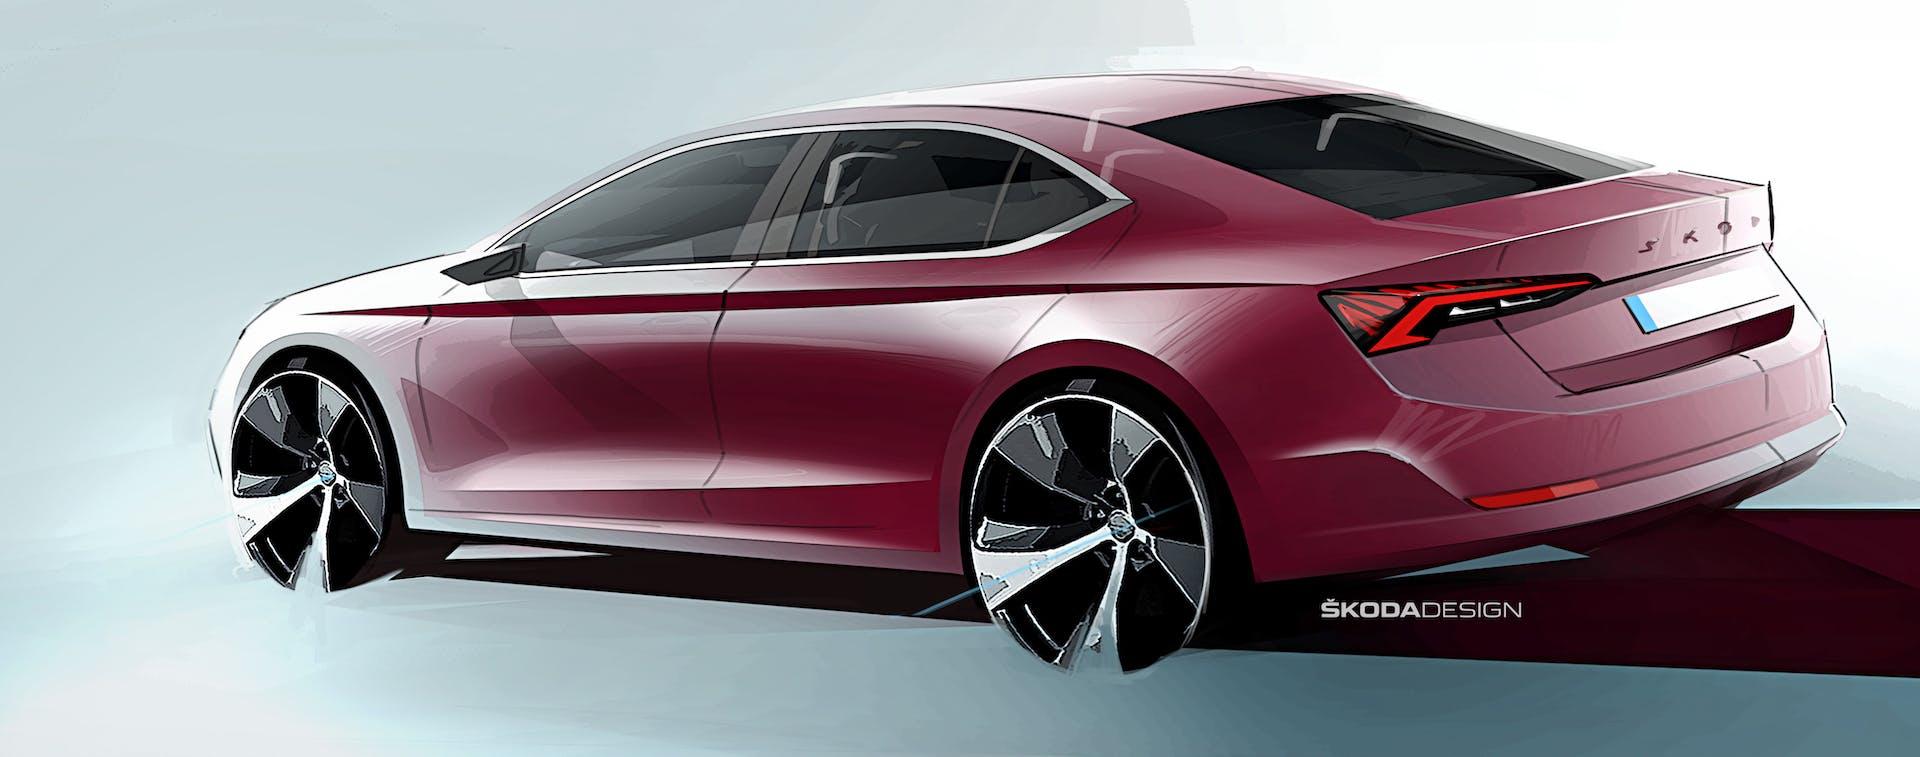 Nuova Skoda Octavia teaser posteriore